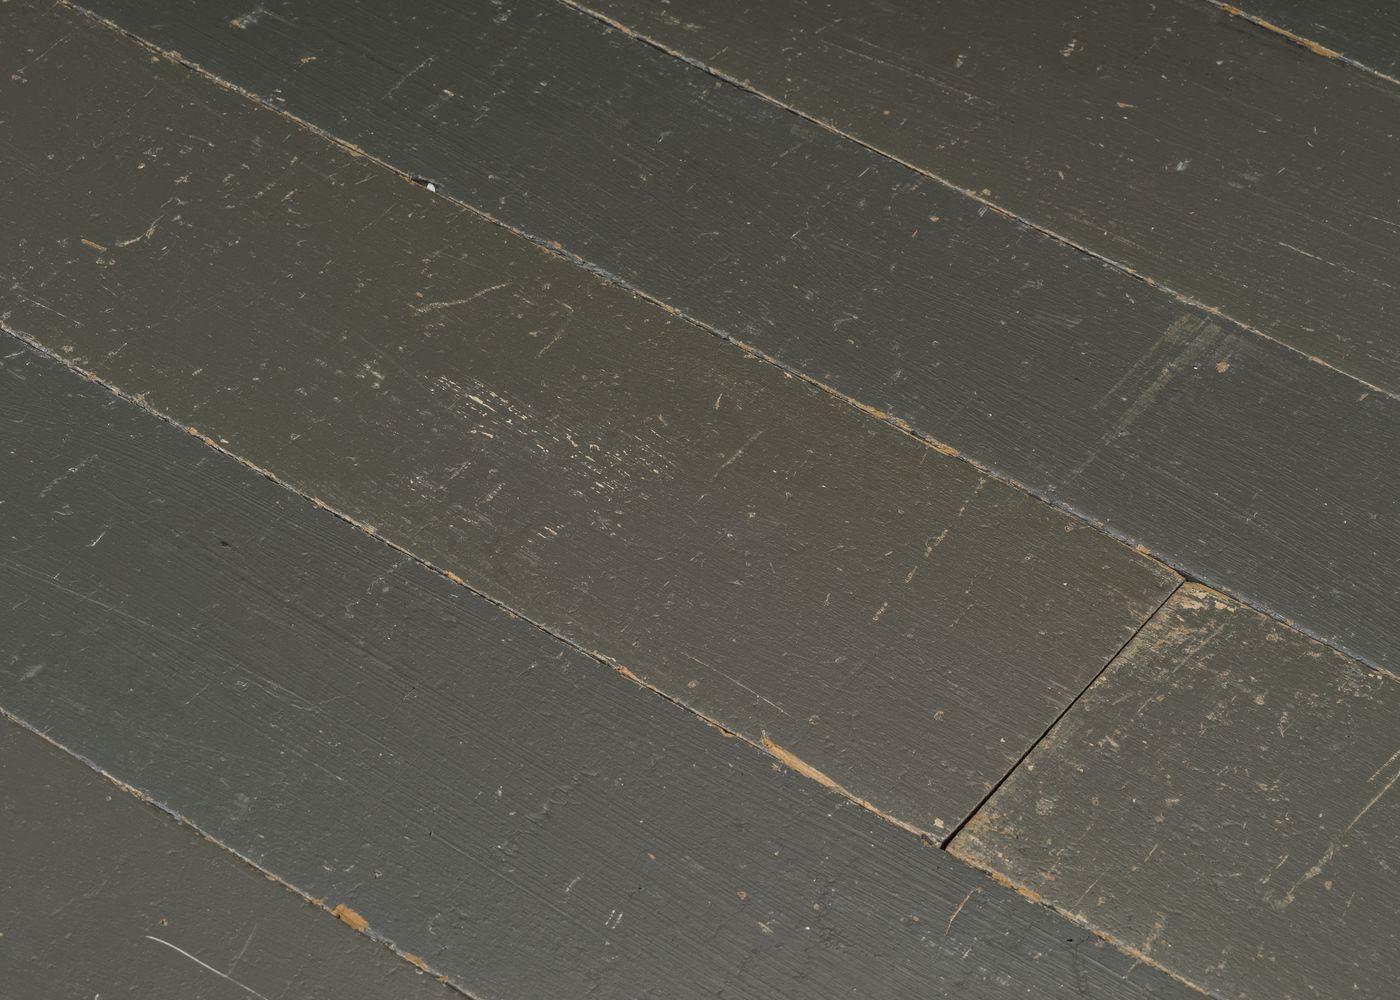 Parquet chêne massif PEINT GRIS vieilli huile cire 15x340x400-200015x120-200x1800-2700